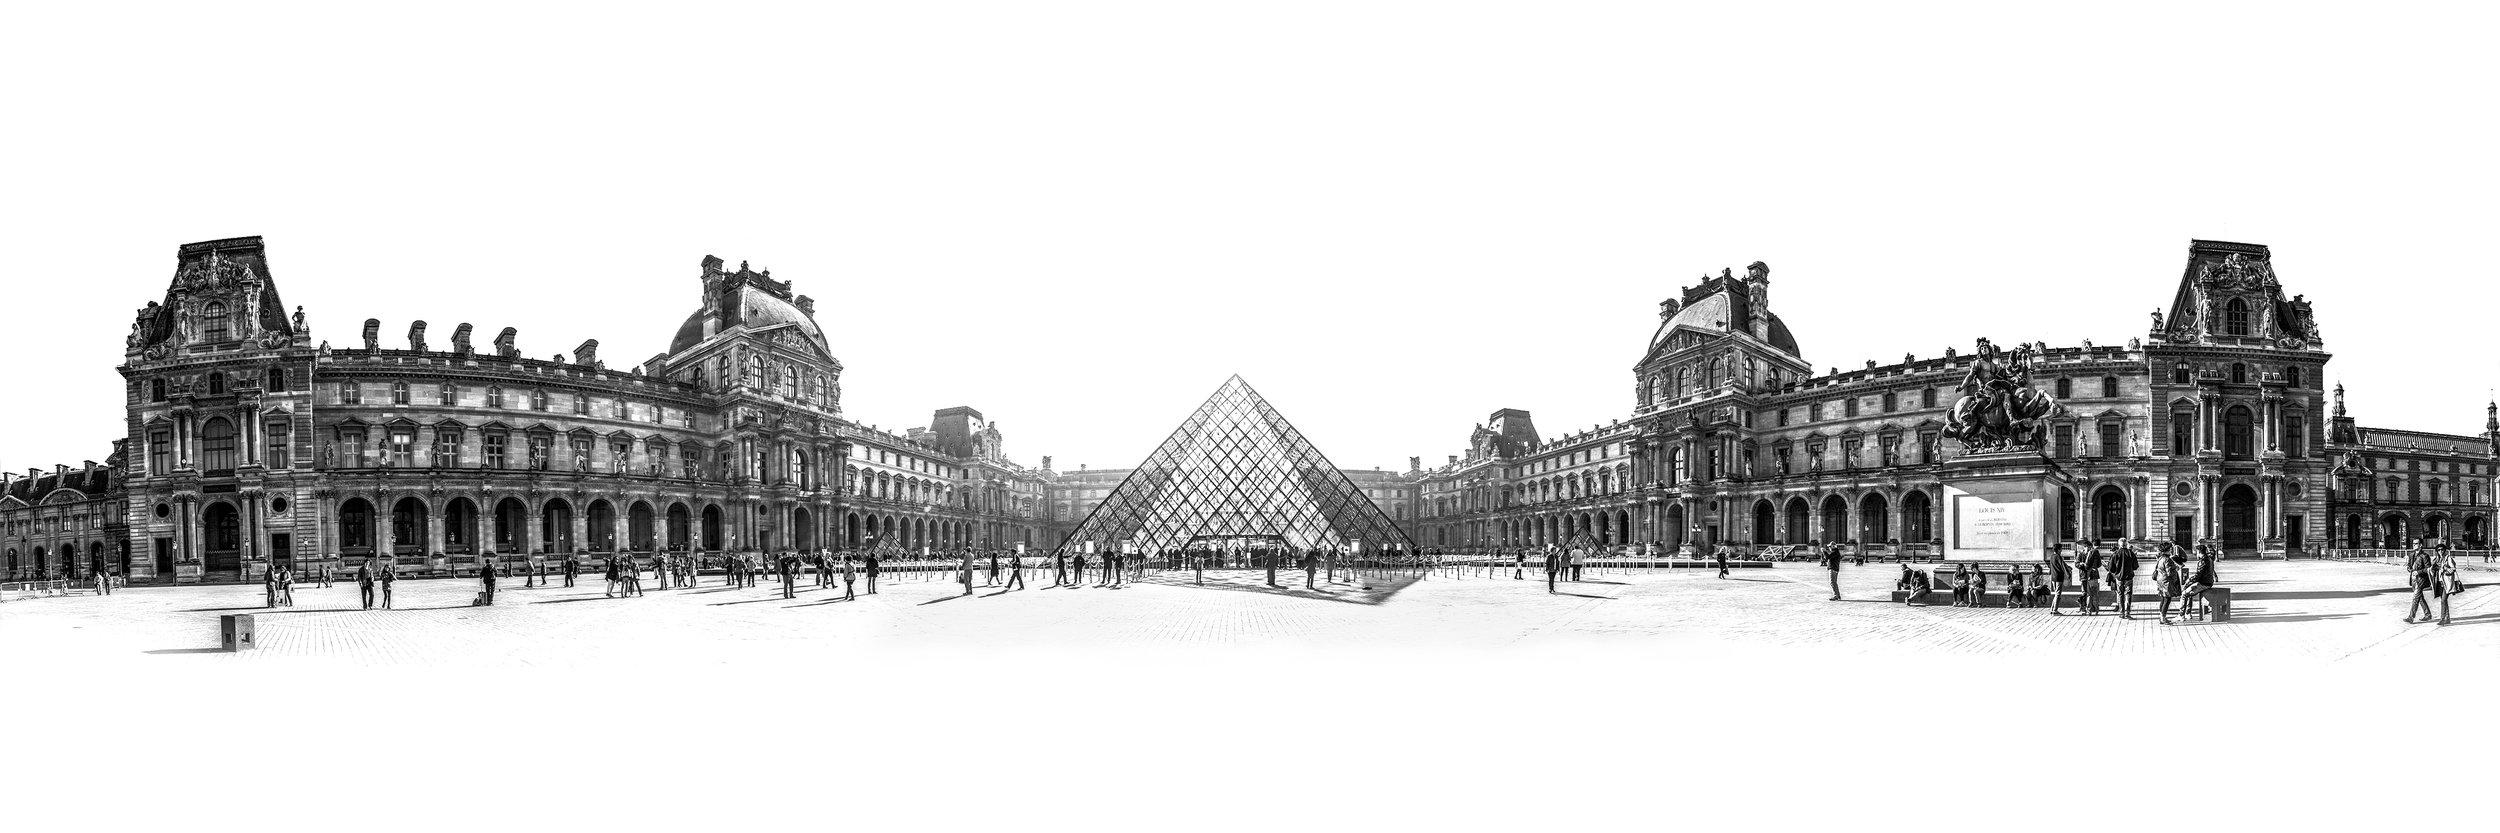 The Louvre 2.jpg